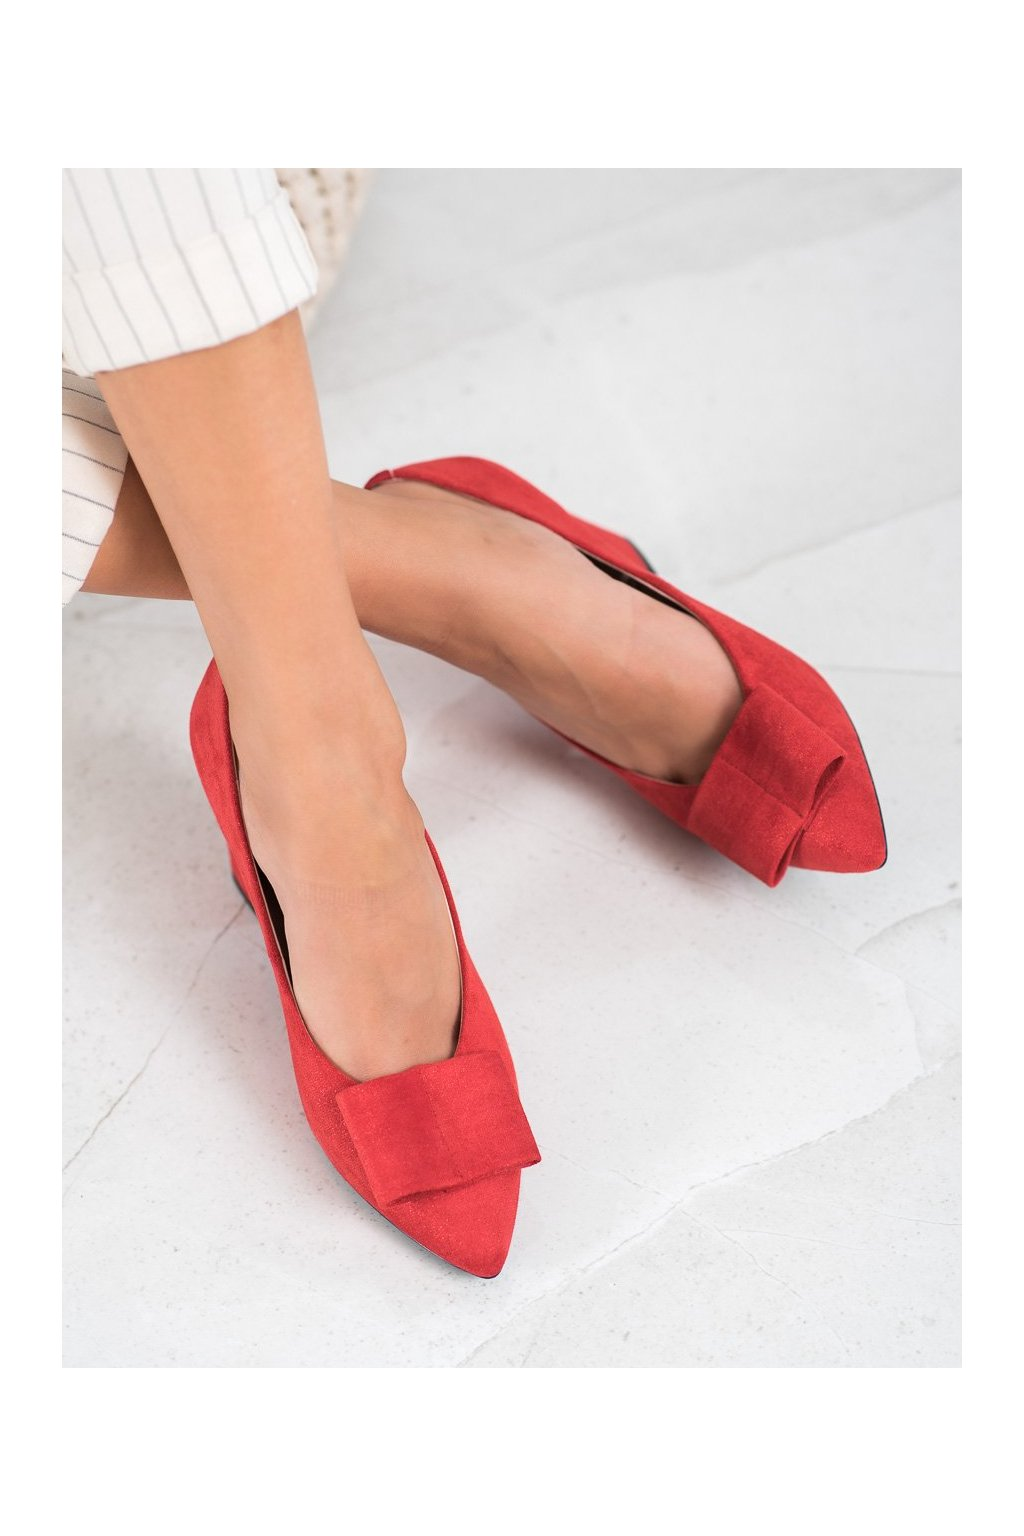 Červené dámske lodičky W. potocki kod XY20-10514R